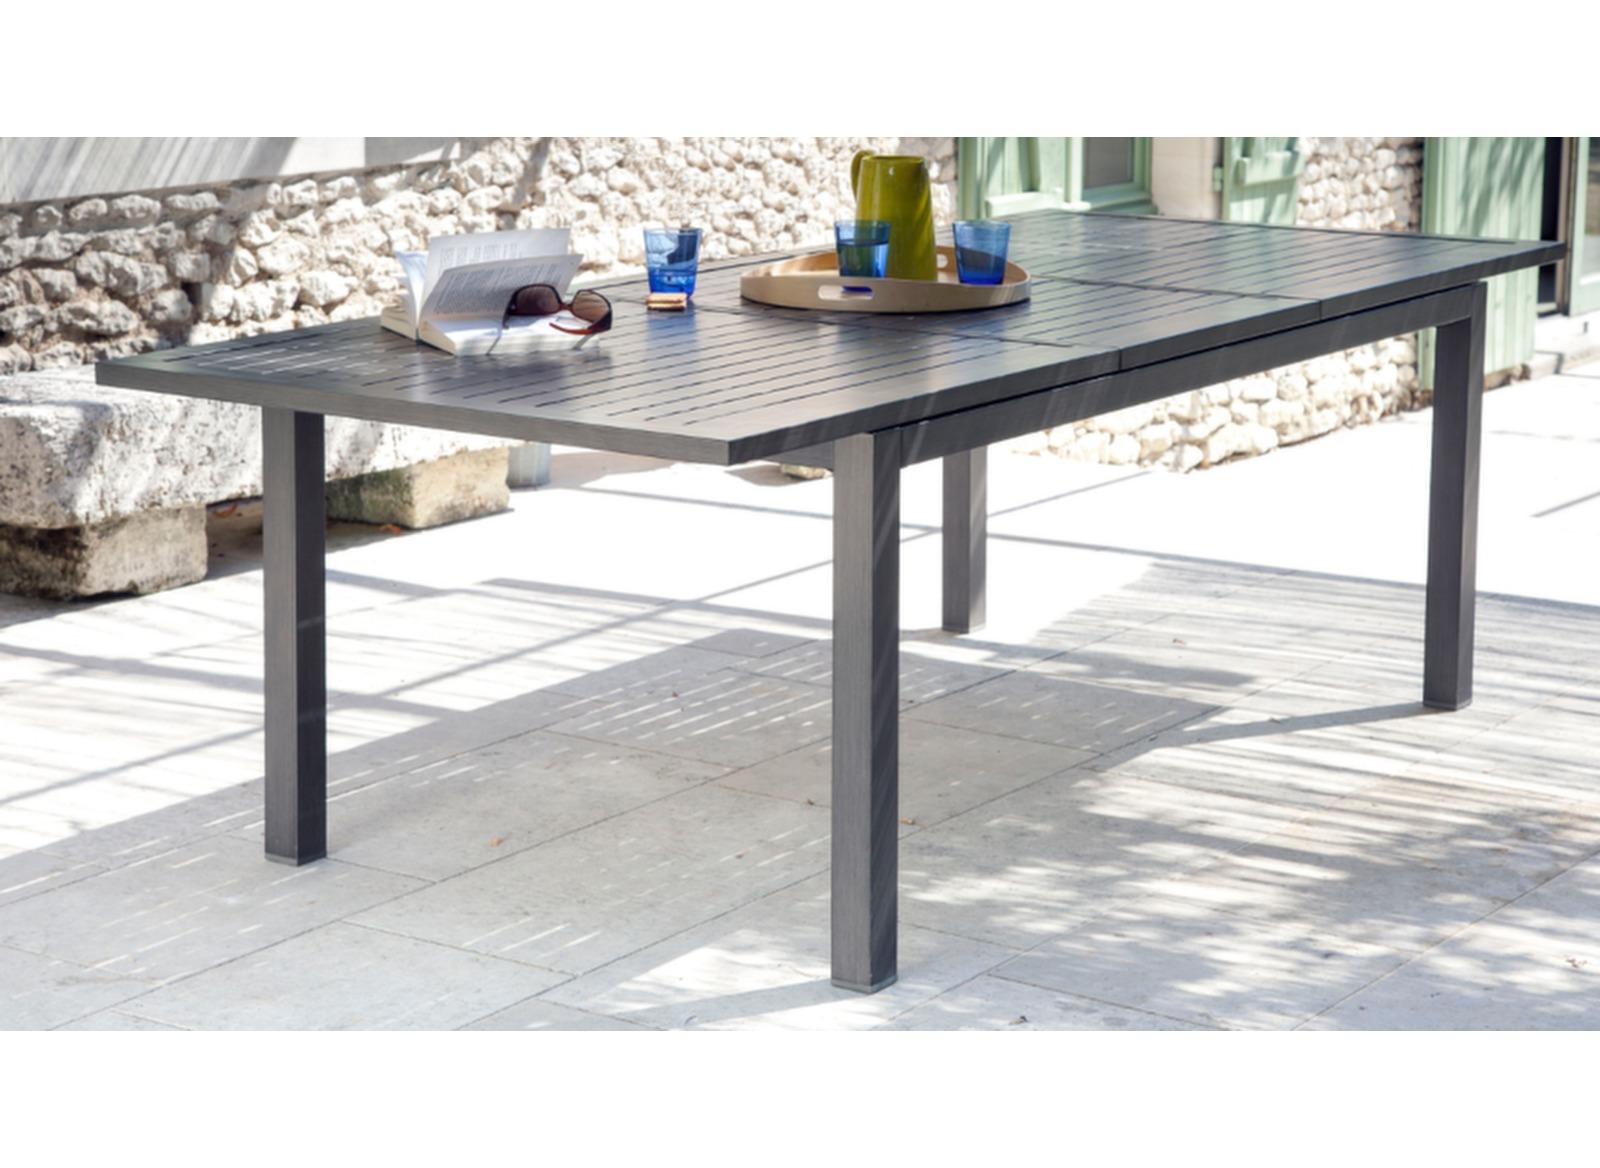 Table extensible milano 180 240 x 100 cm mobilier de for Table extensible pour veranda